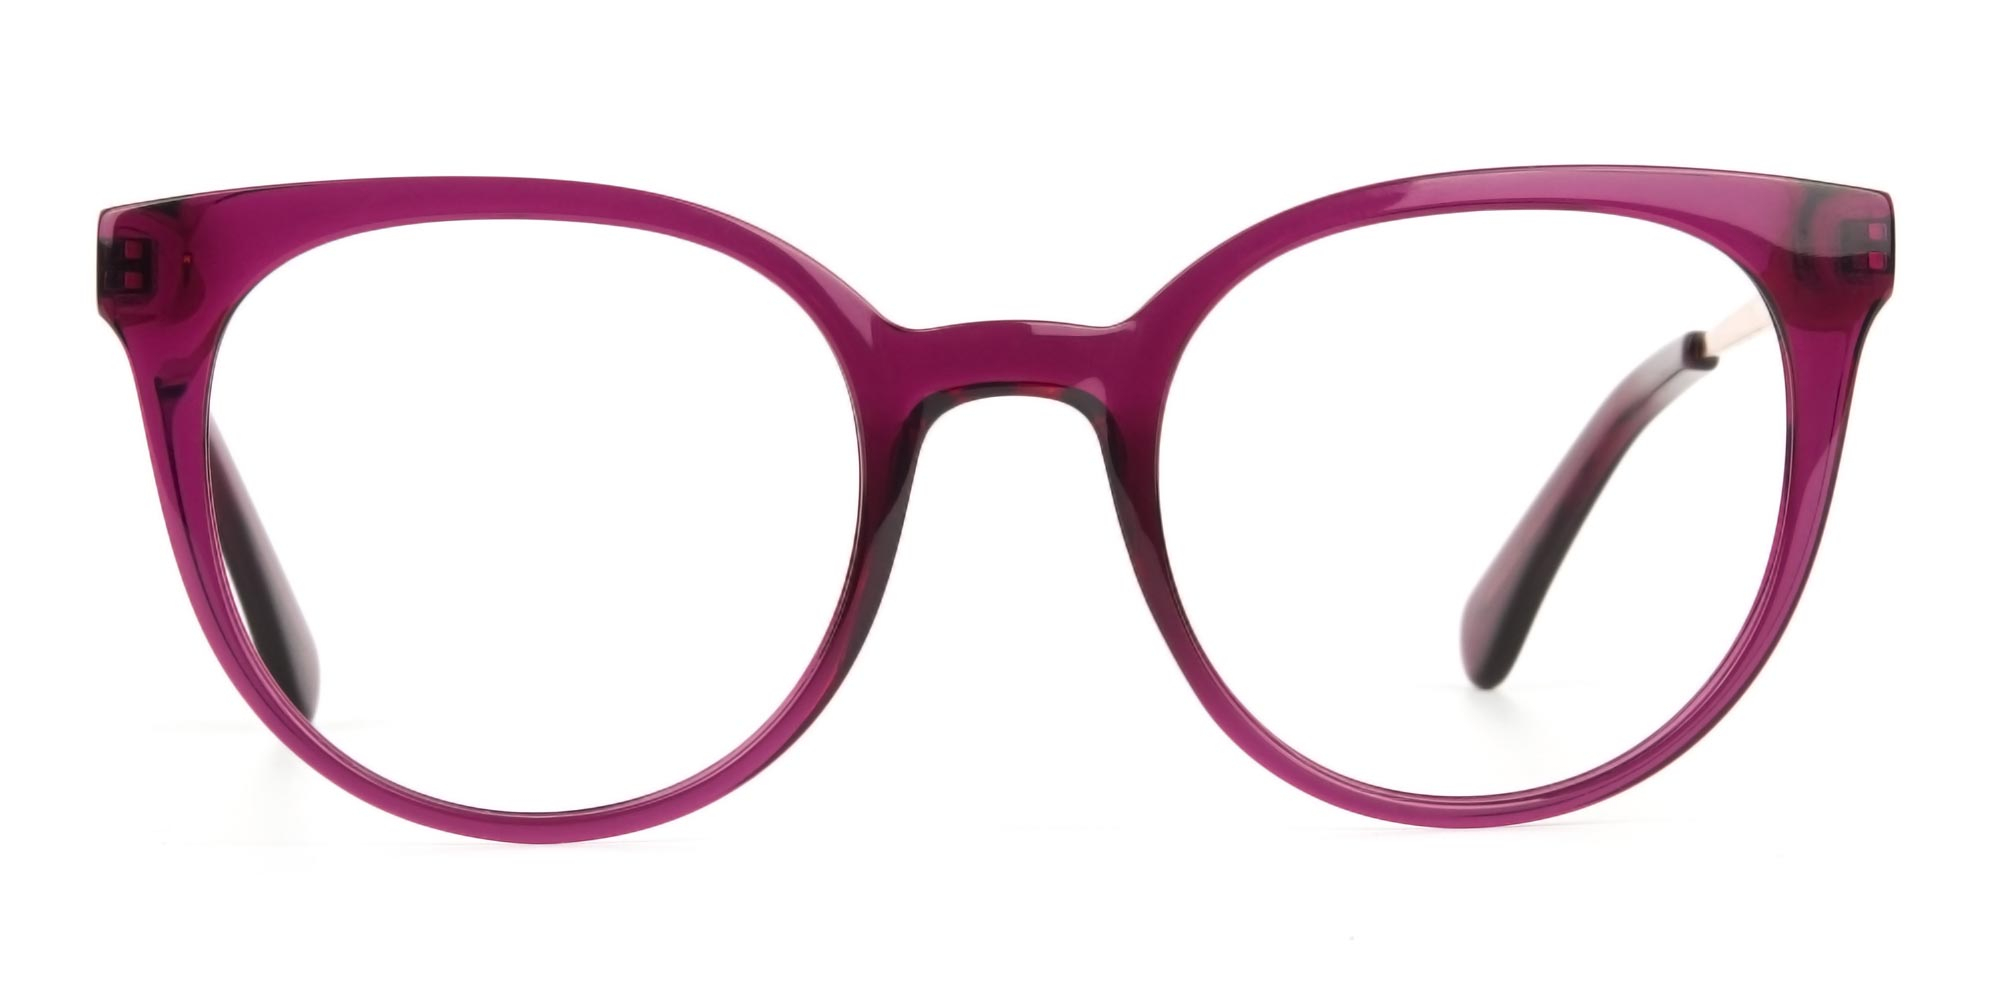 magenta cat eye glasses for triangle face shape